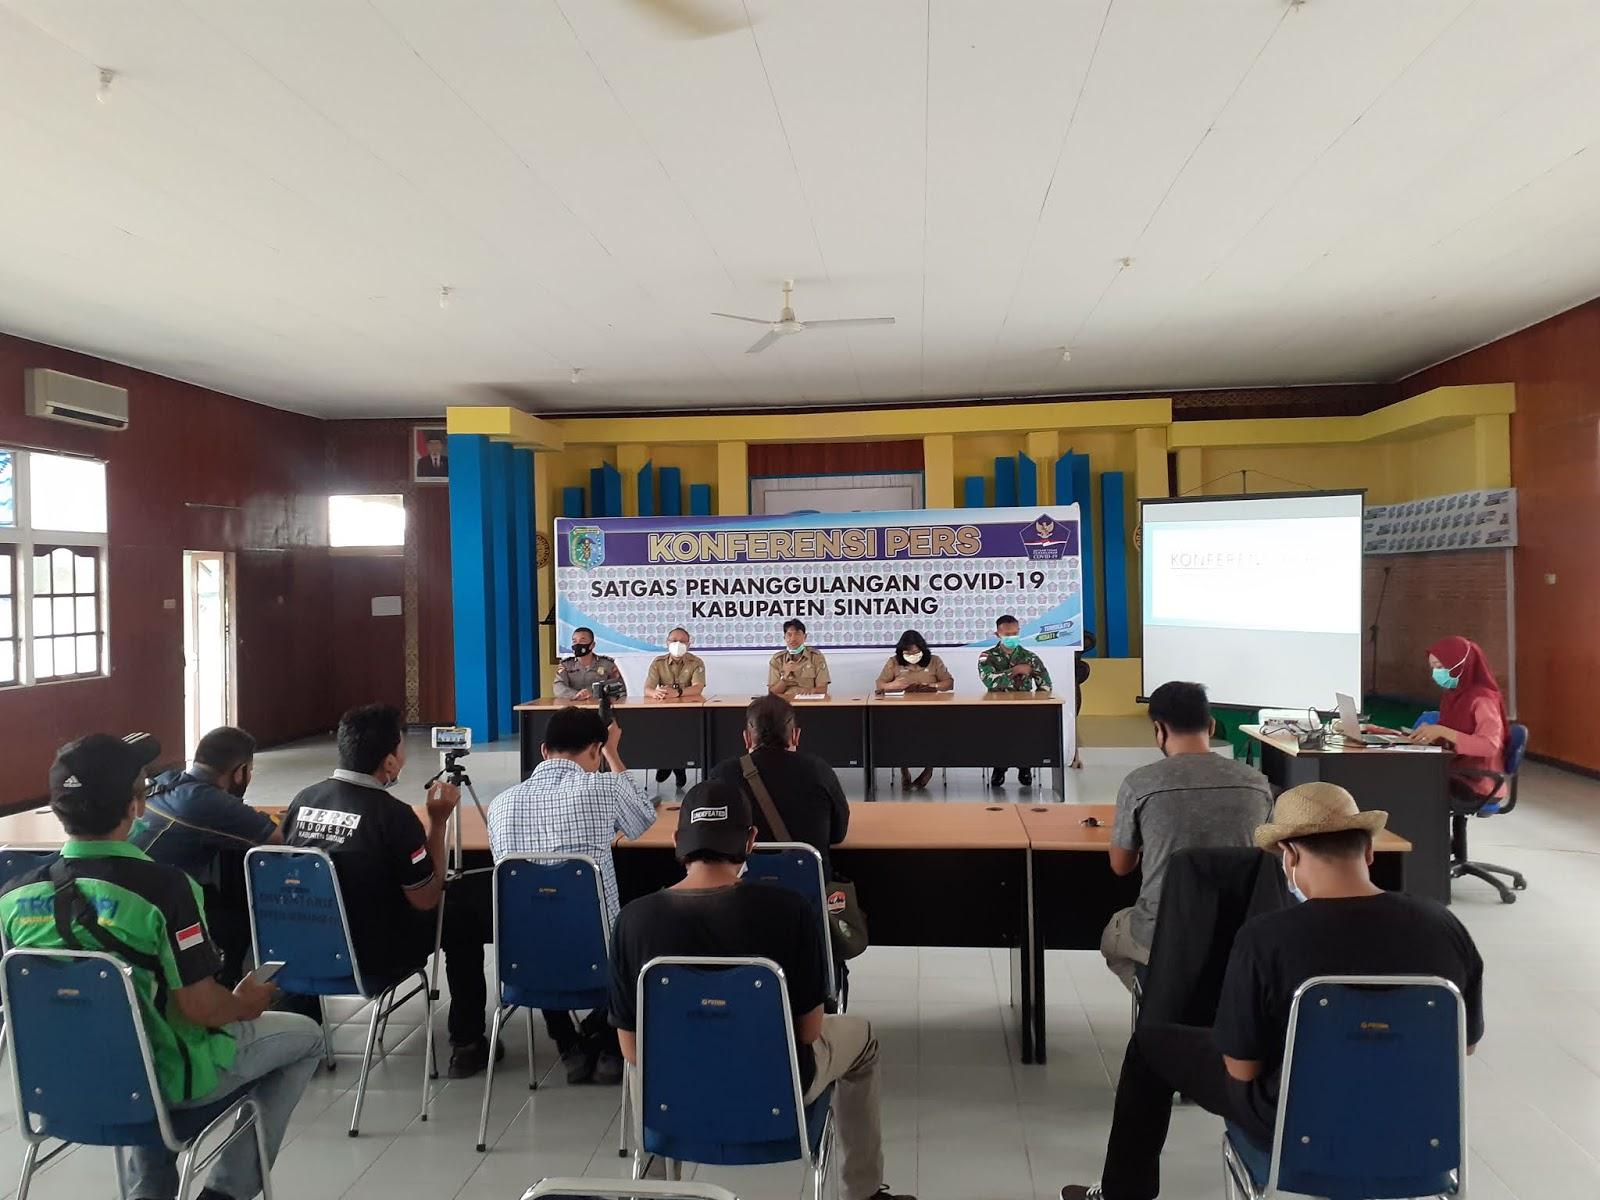 Data Covid-19 Kabupaten Sintang Penyampayaan Ke 9